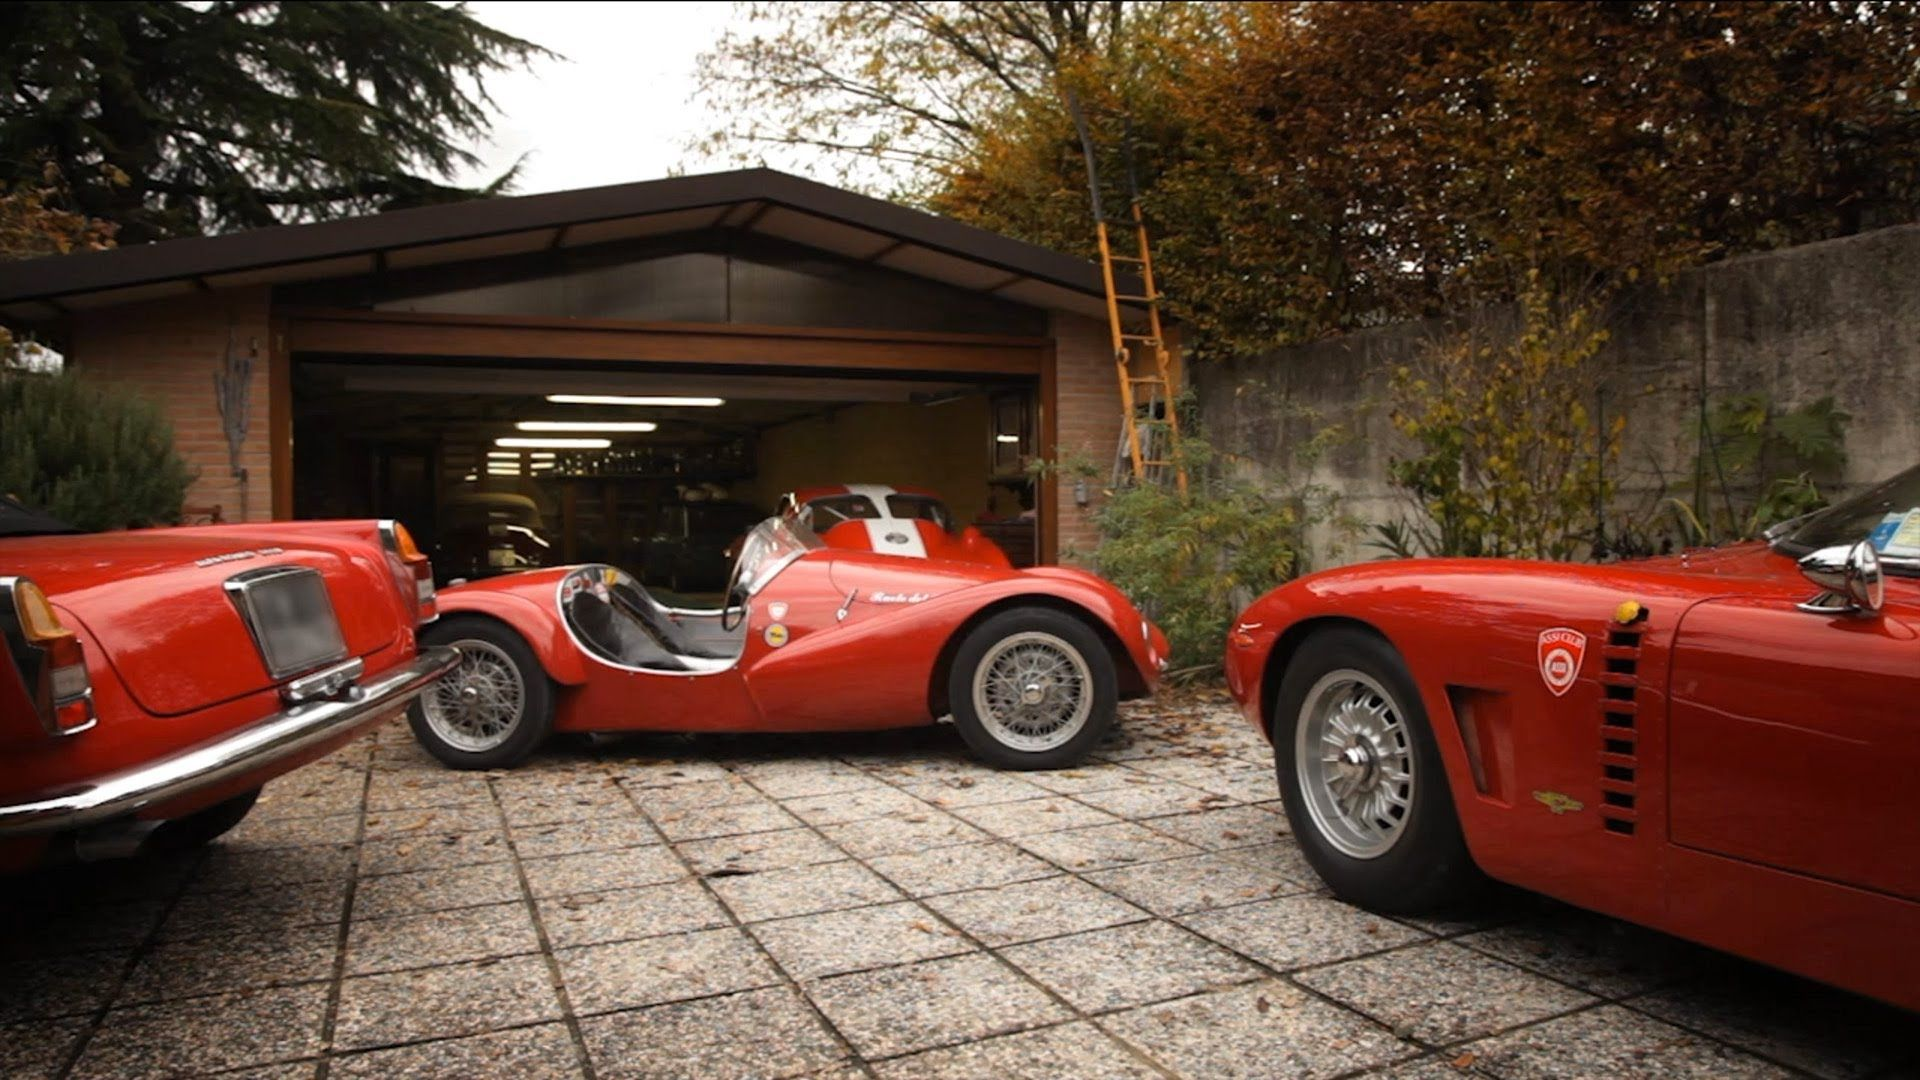 Porsche, Ferrari, Bizzarrini and other fundamental steps in life ...